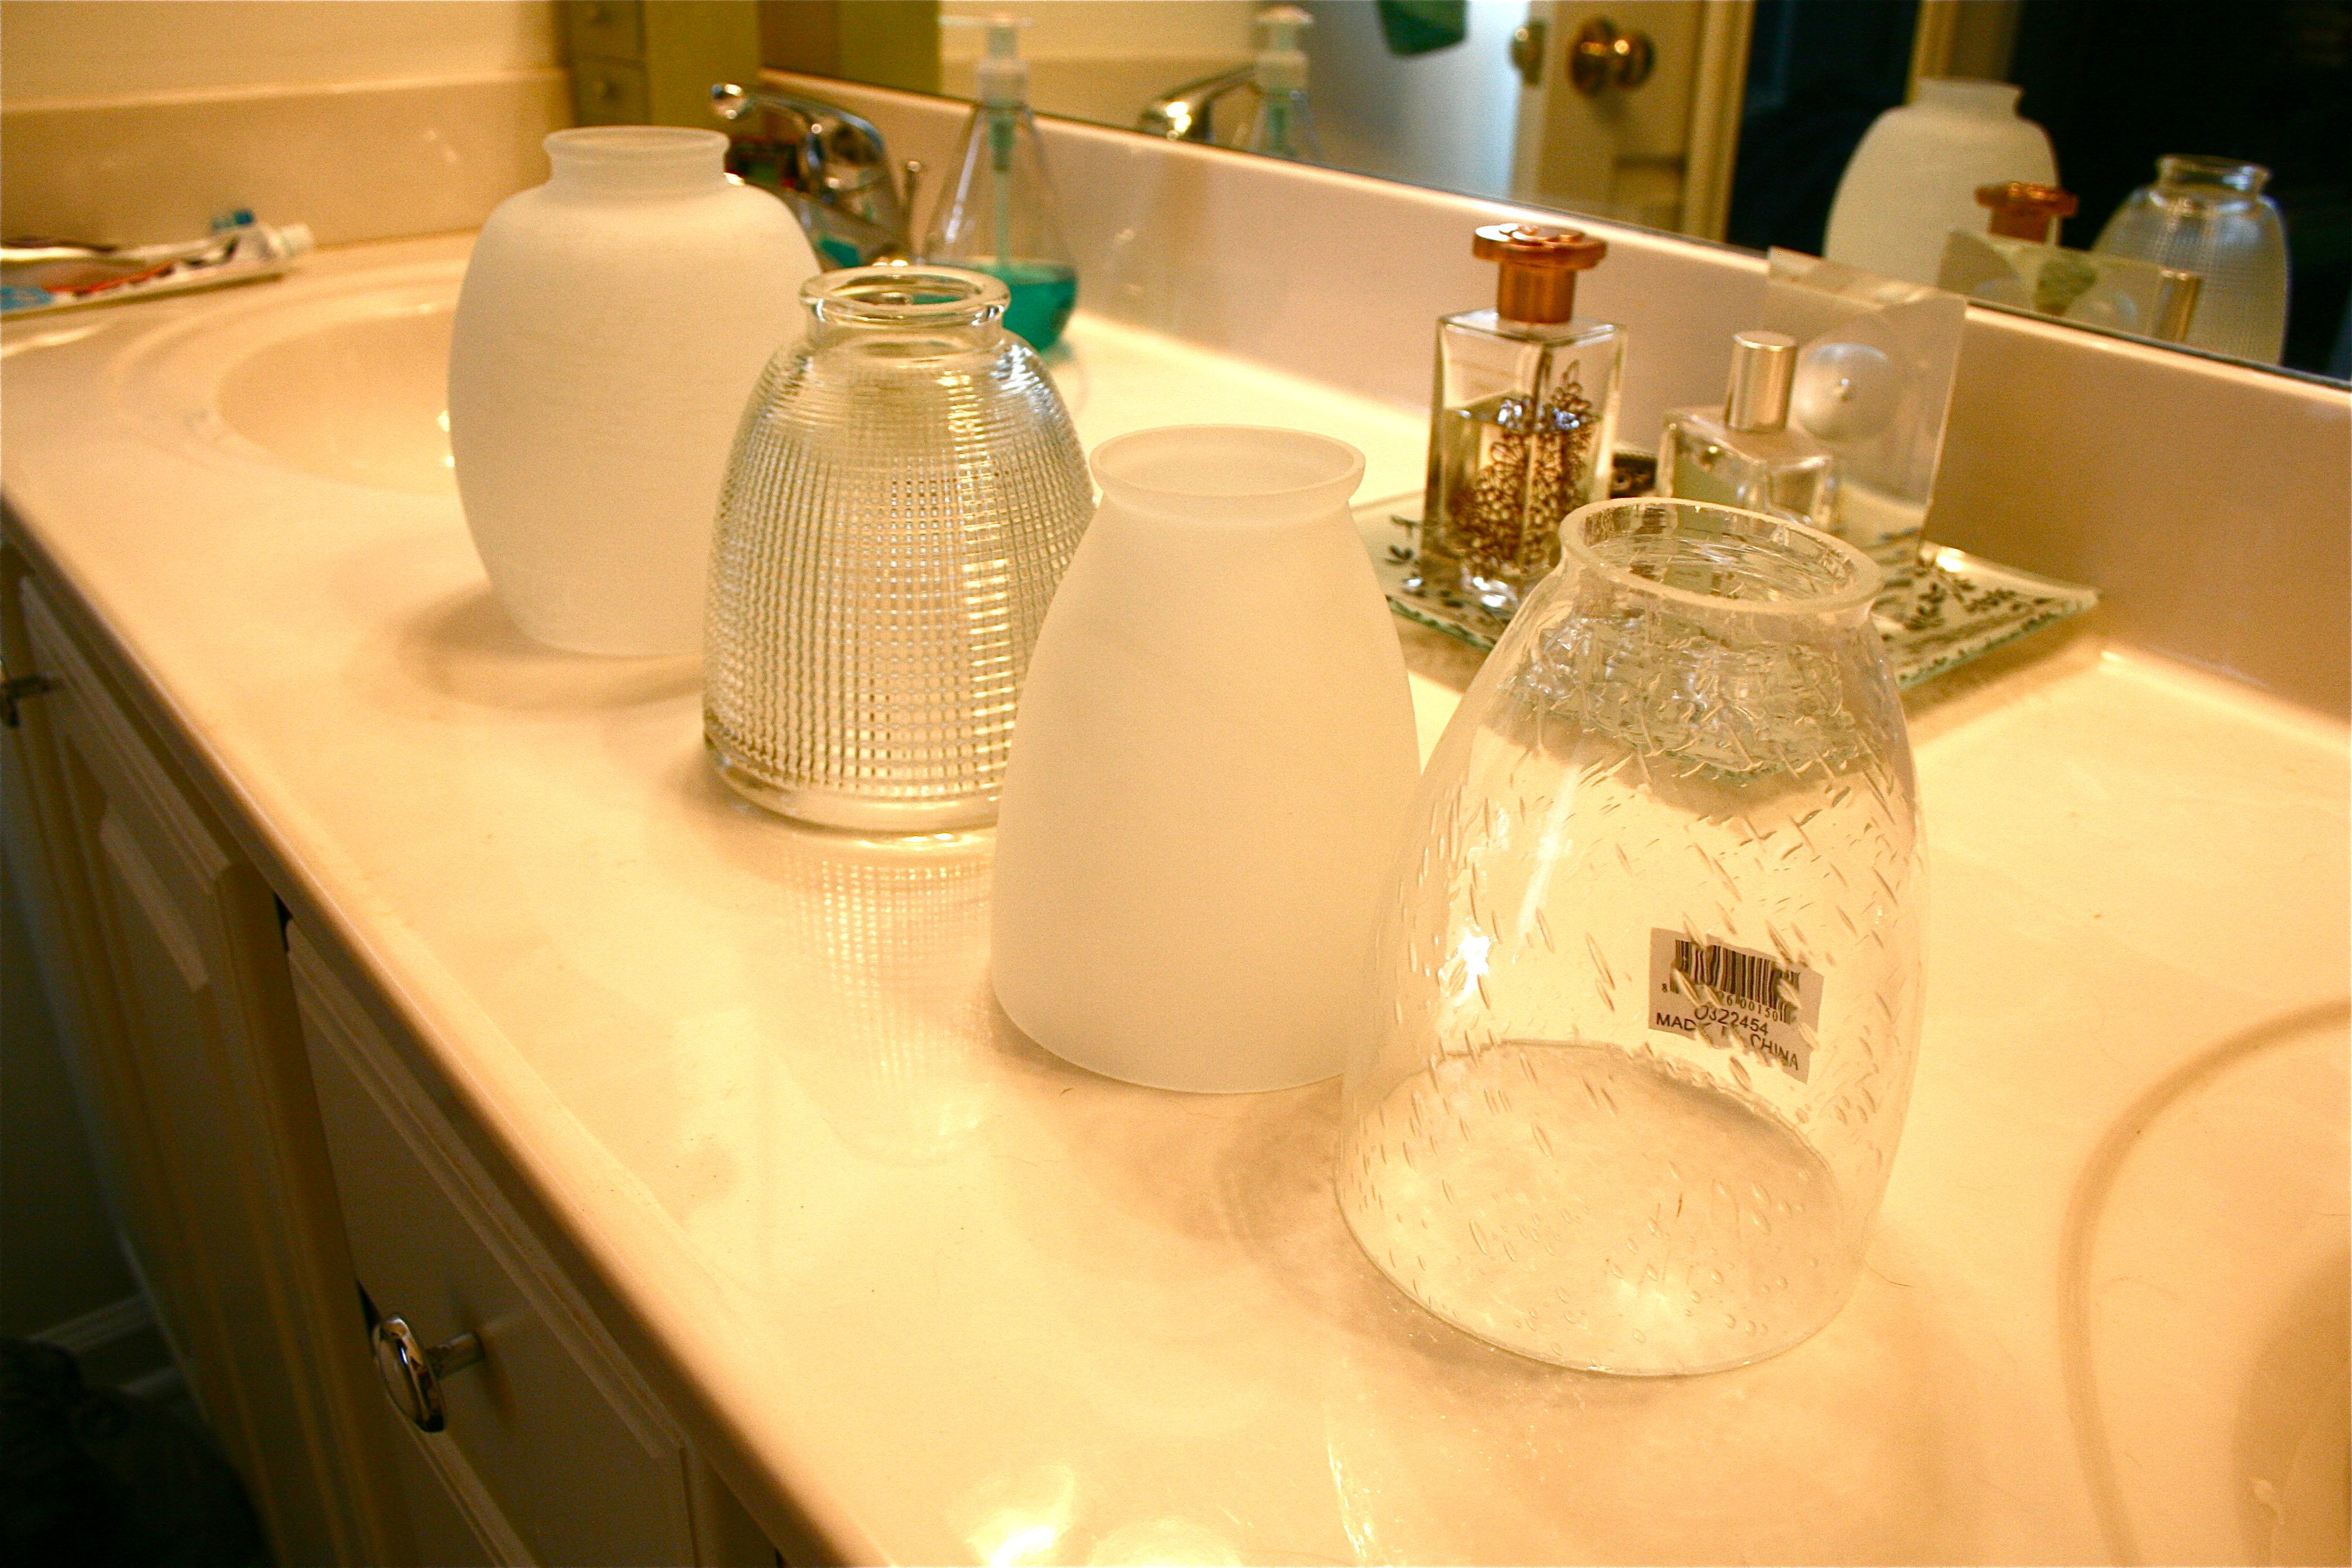 Updating The Bathroom Light Fixture Dream Green DIY - Bathroom light shades replacement for bathroom decor ideas